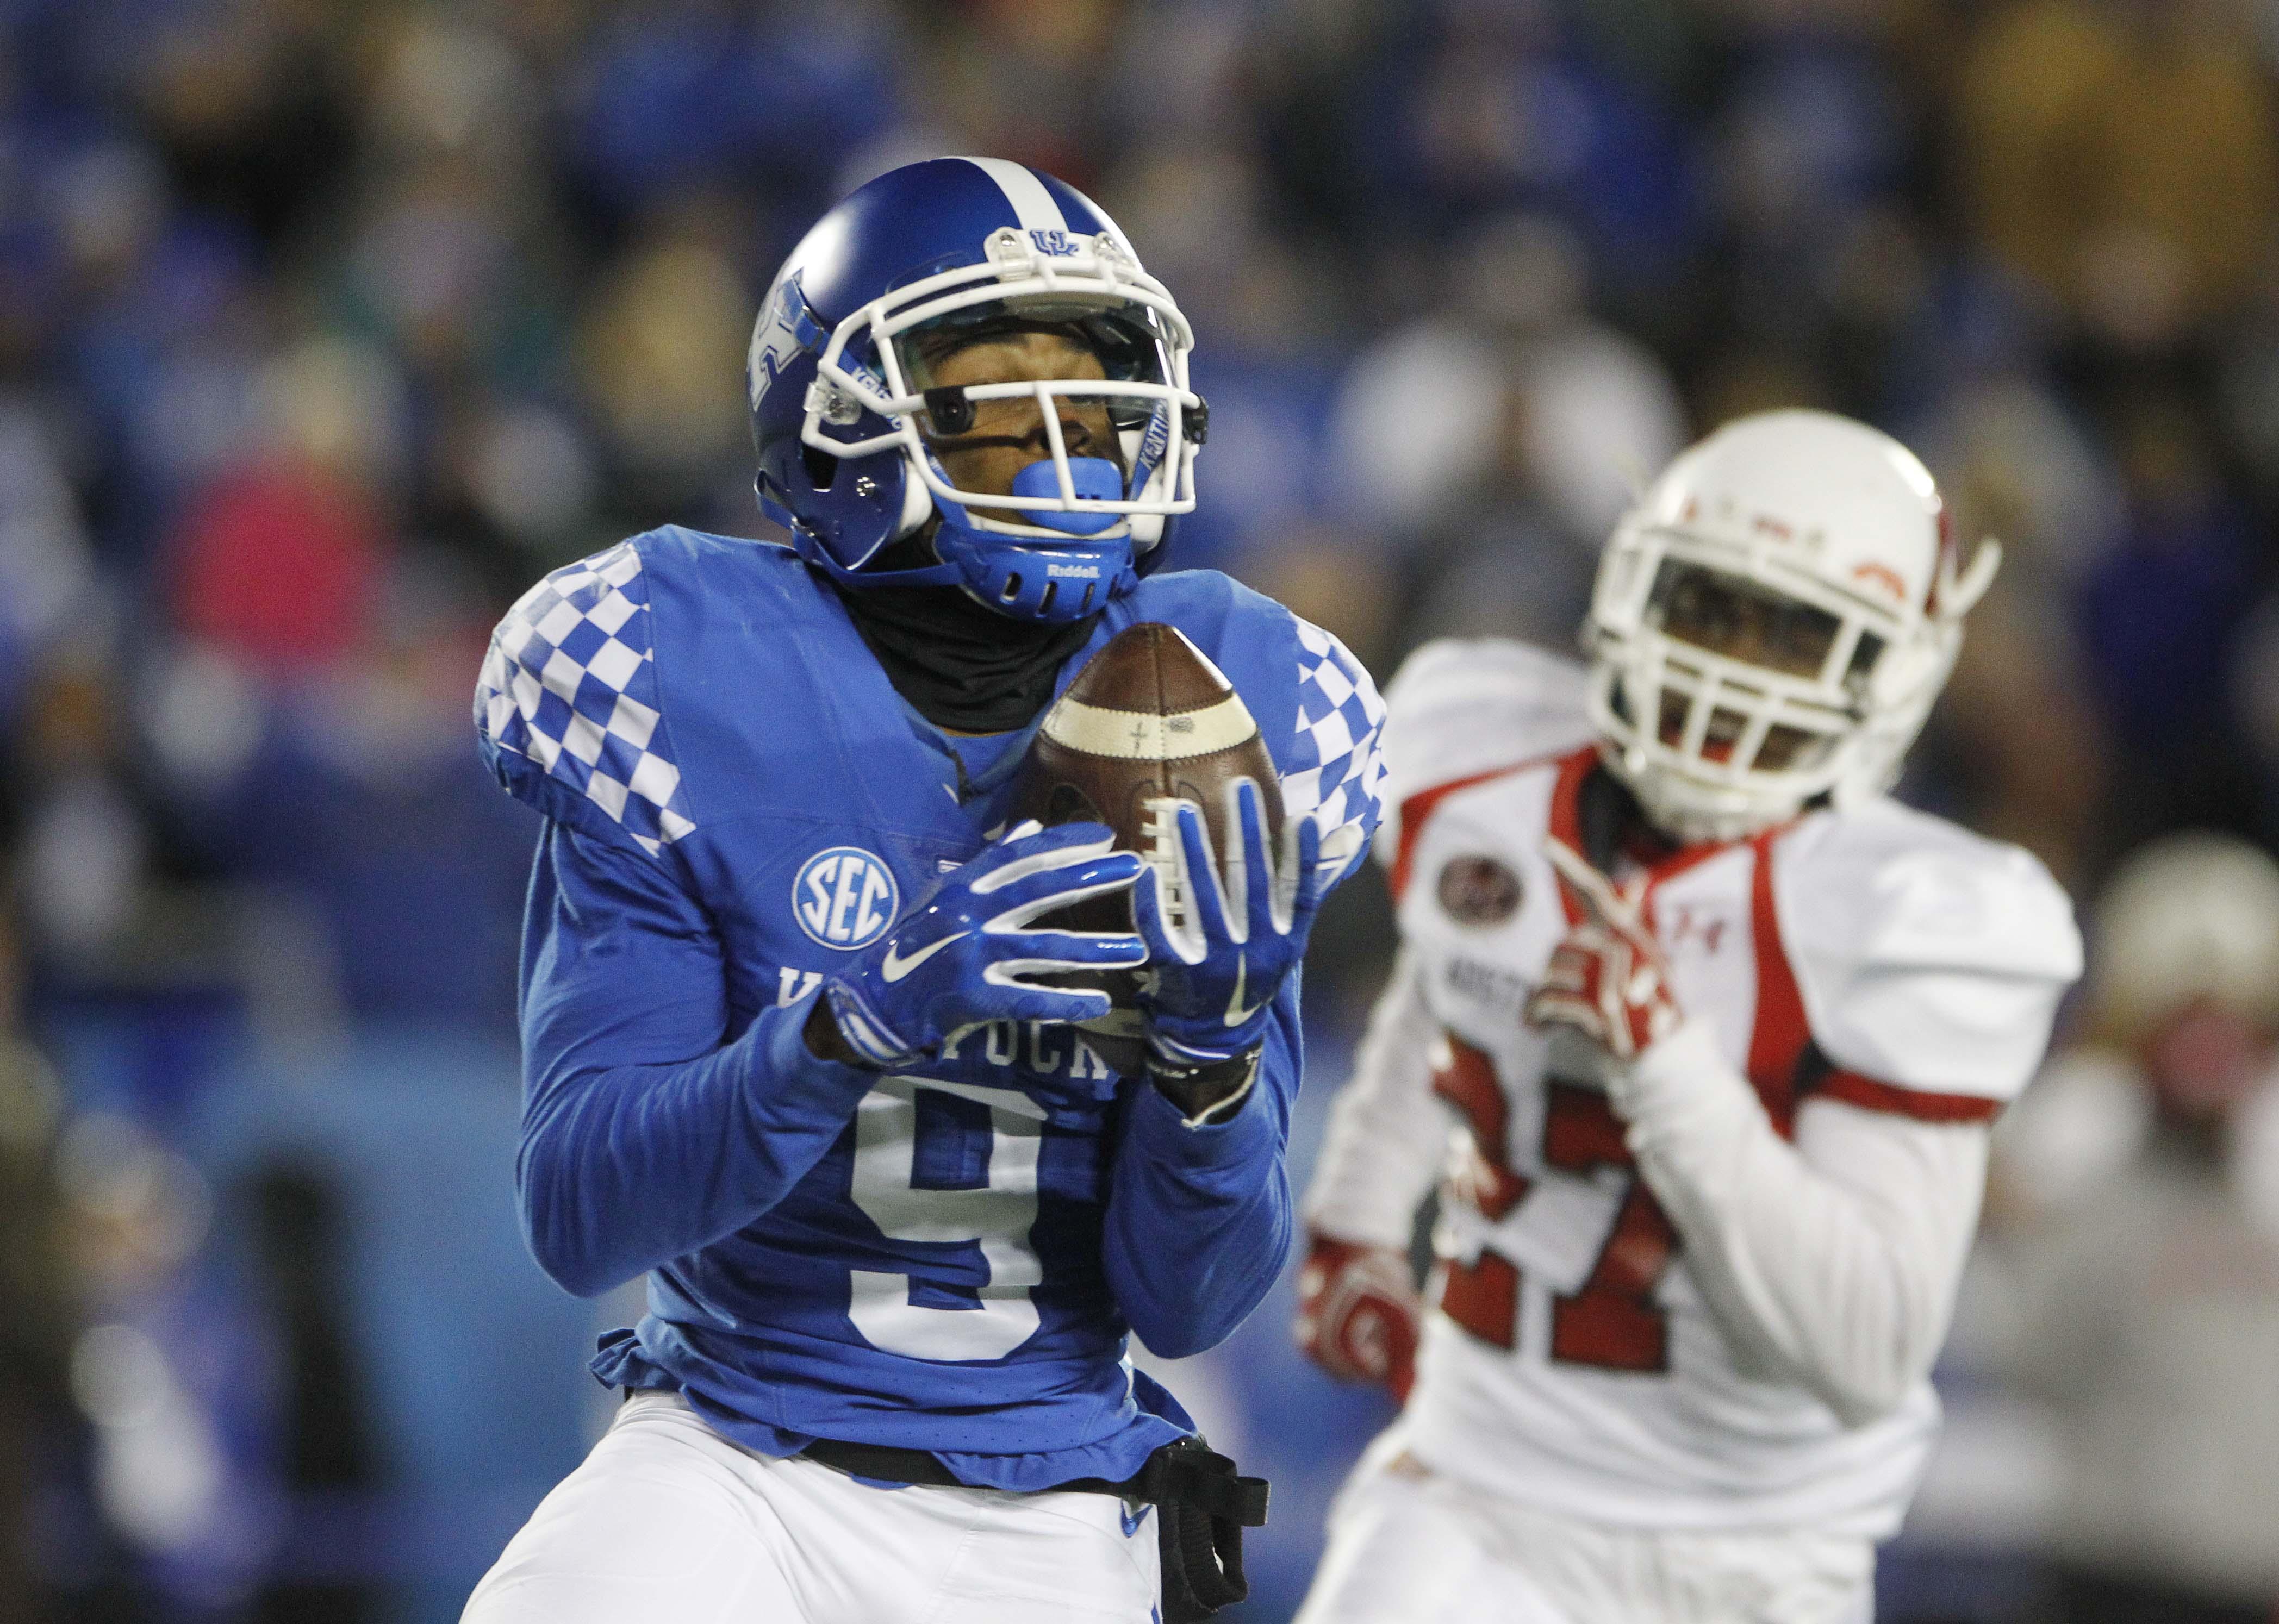 NCAA Football: Austin Peay at Kentucky